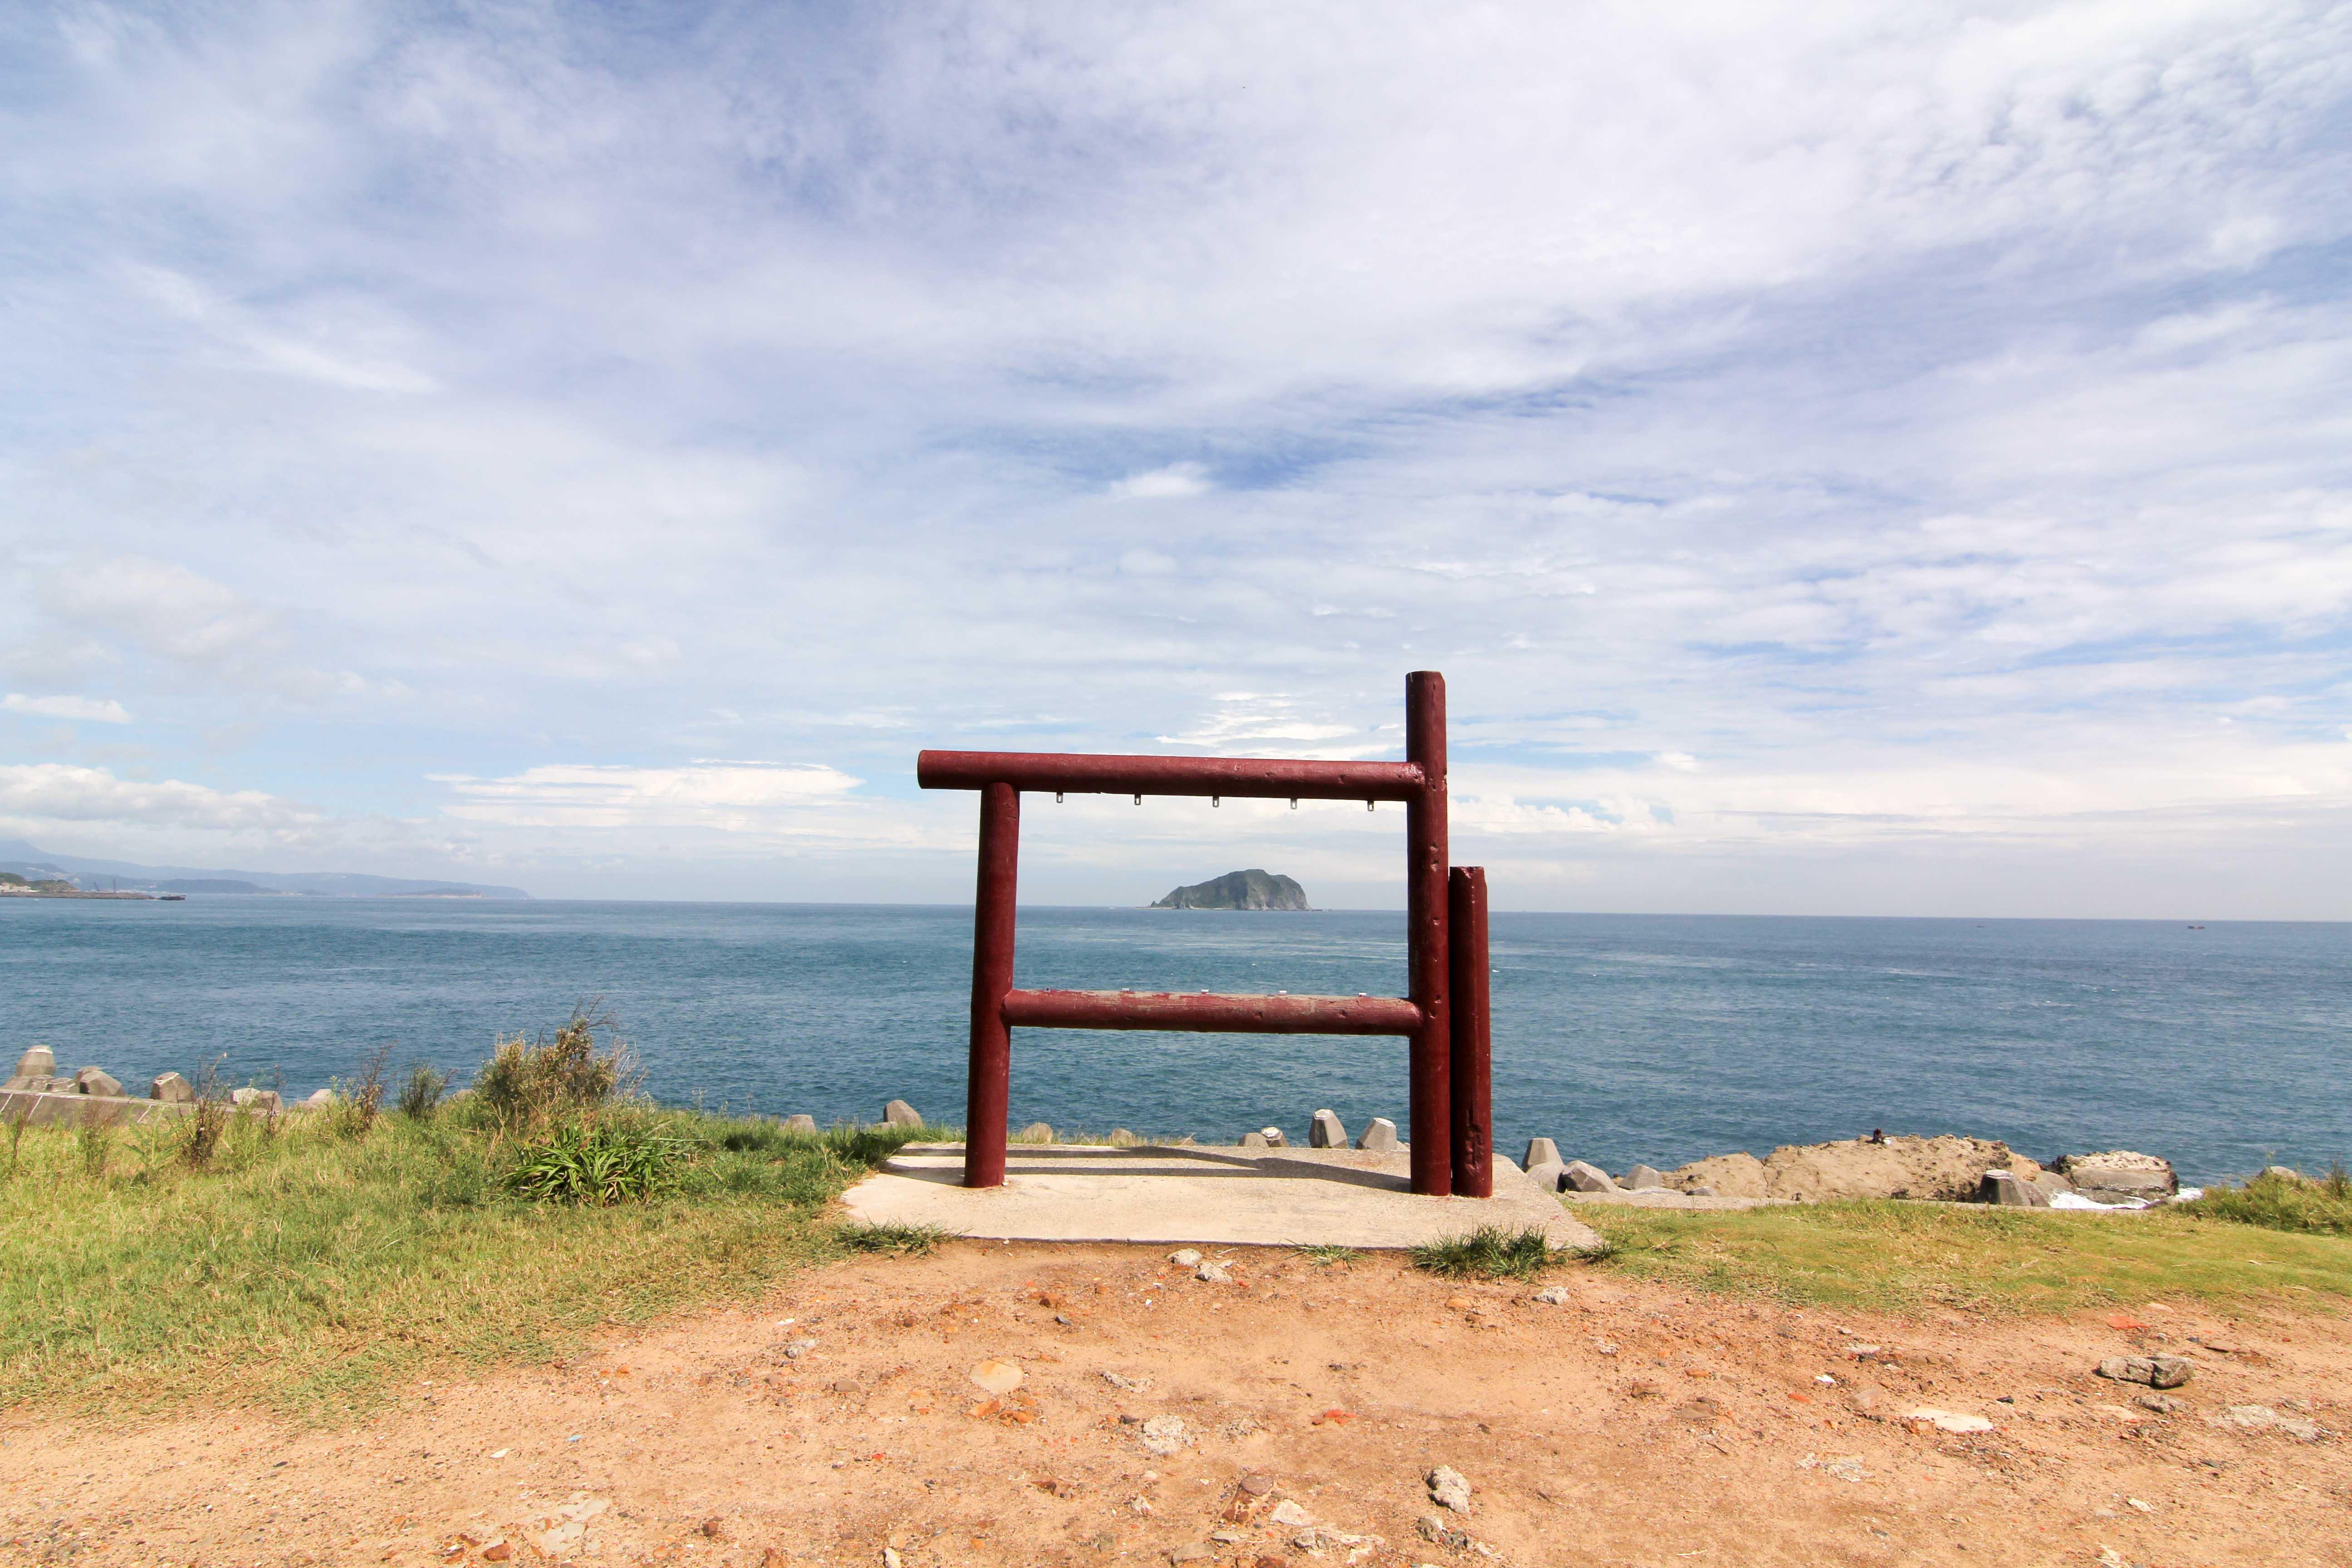 潮境公園拍照框\